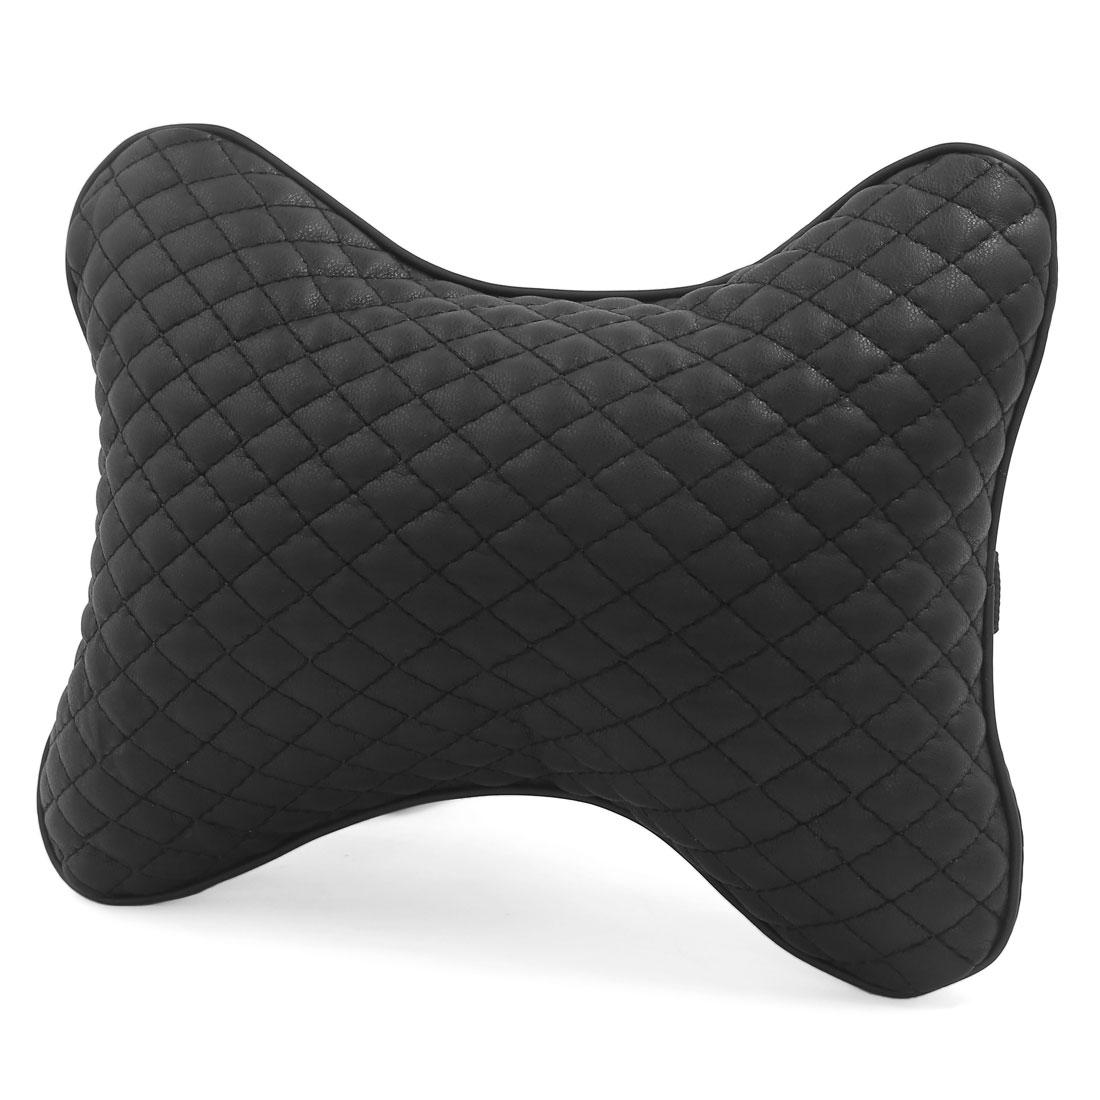 Black Car Vehicle Auto Seat Head Neck Rest Cushion Pad Headrest Pillow